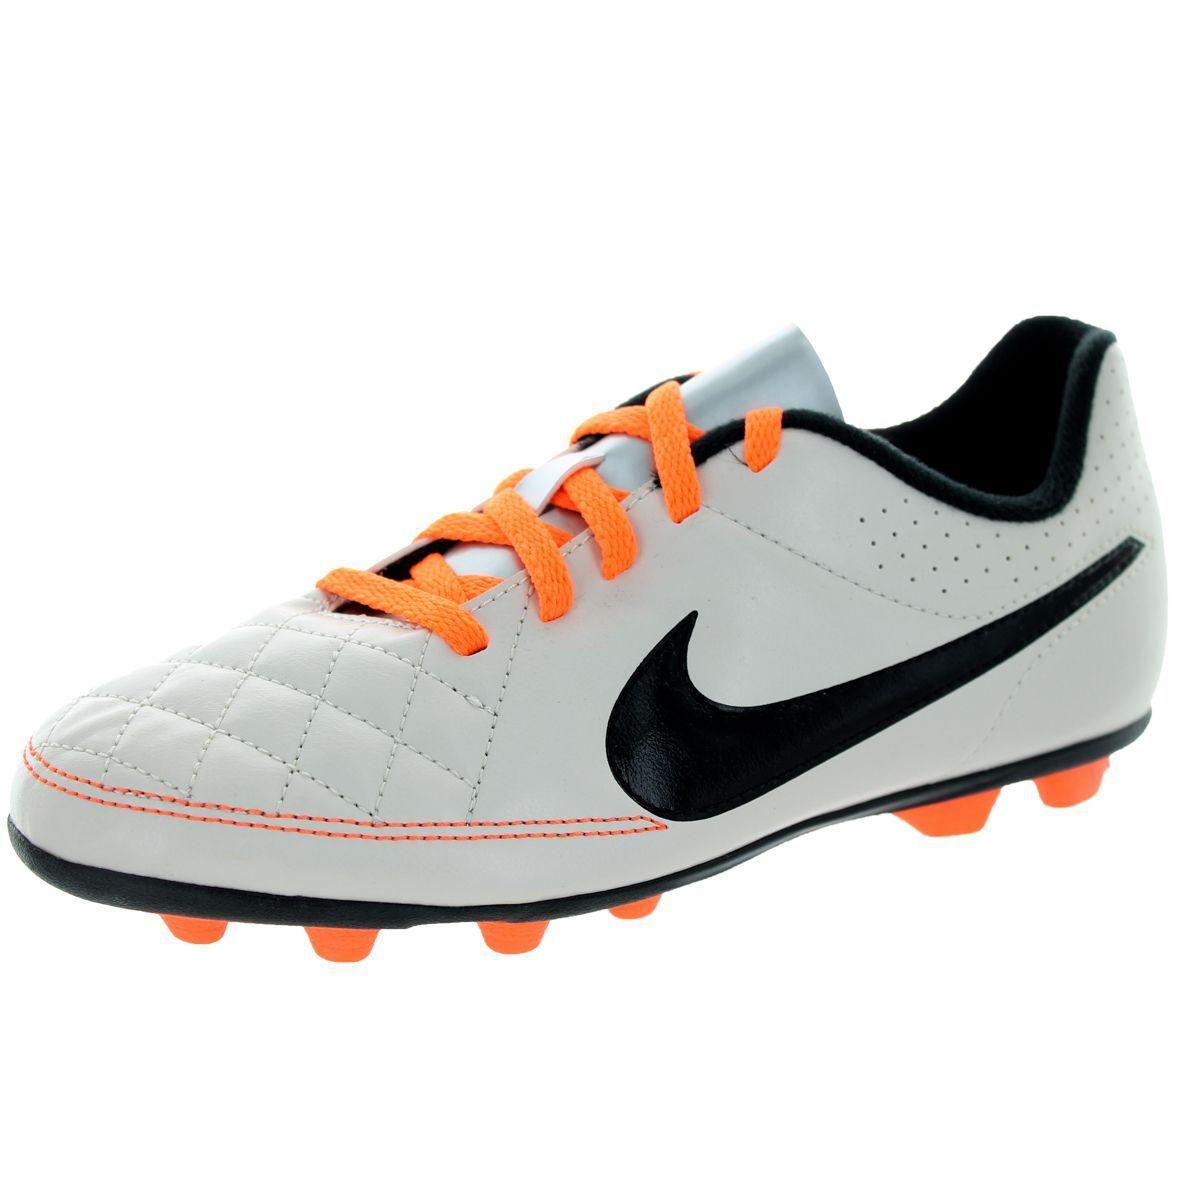 Nike Kid's Jr Tiempo Rio II Fg-R Desert Sand/Black/Atmc Orange Soccer Cleat